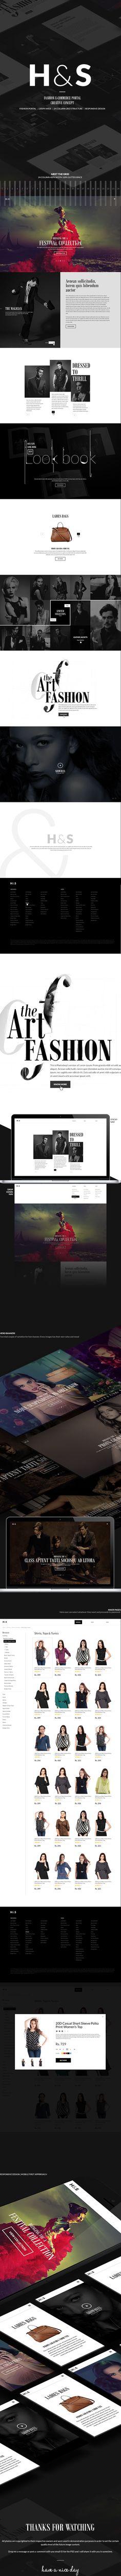 H&S   Fashion Portal   Creative Concept on Behance